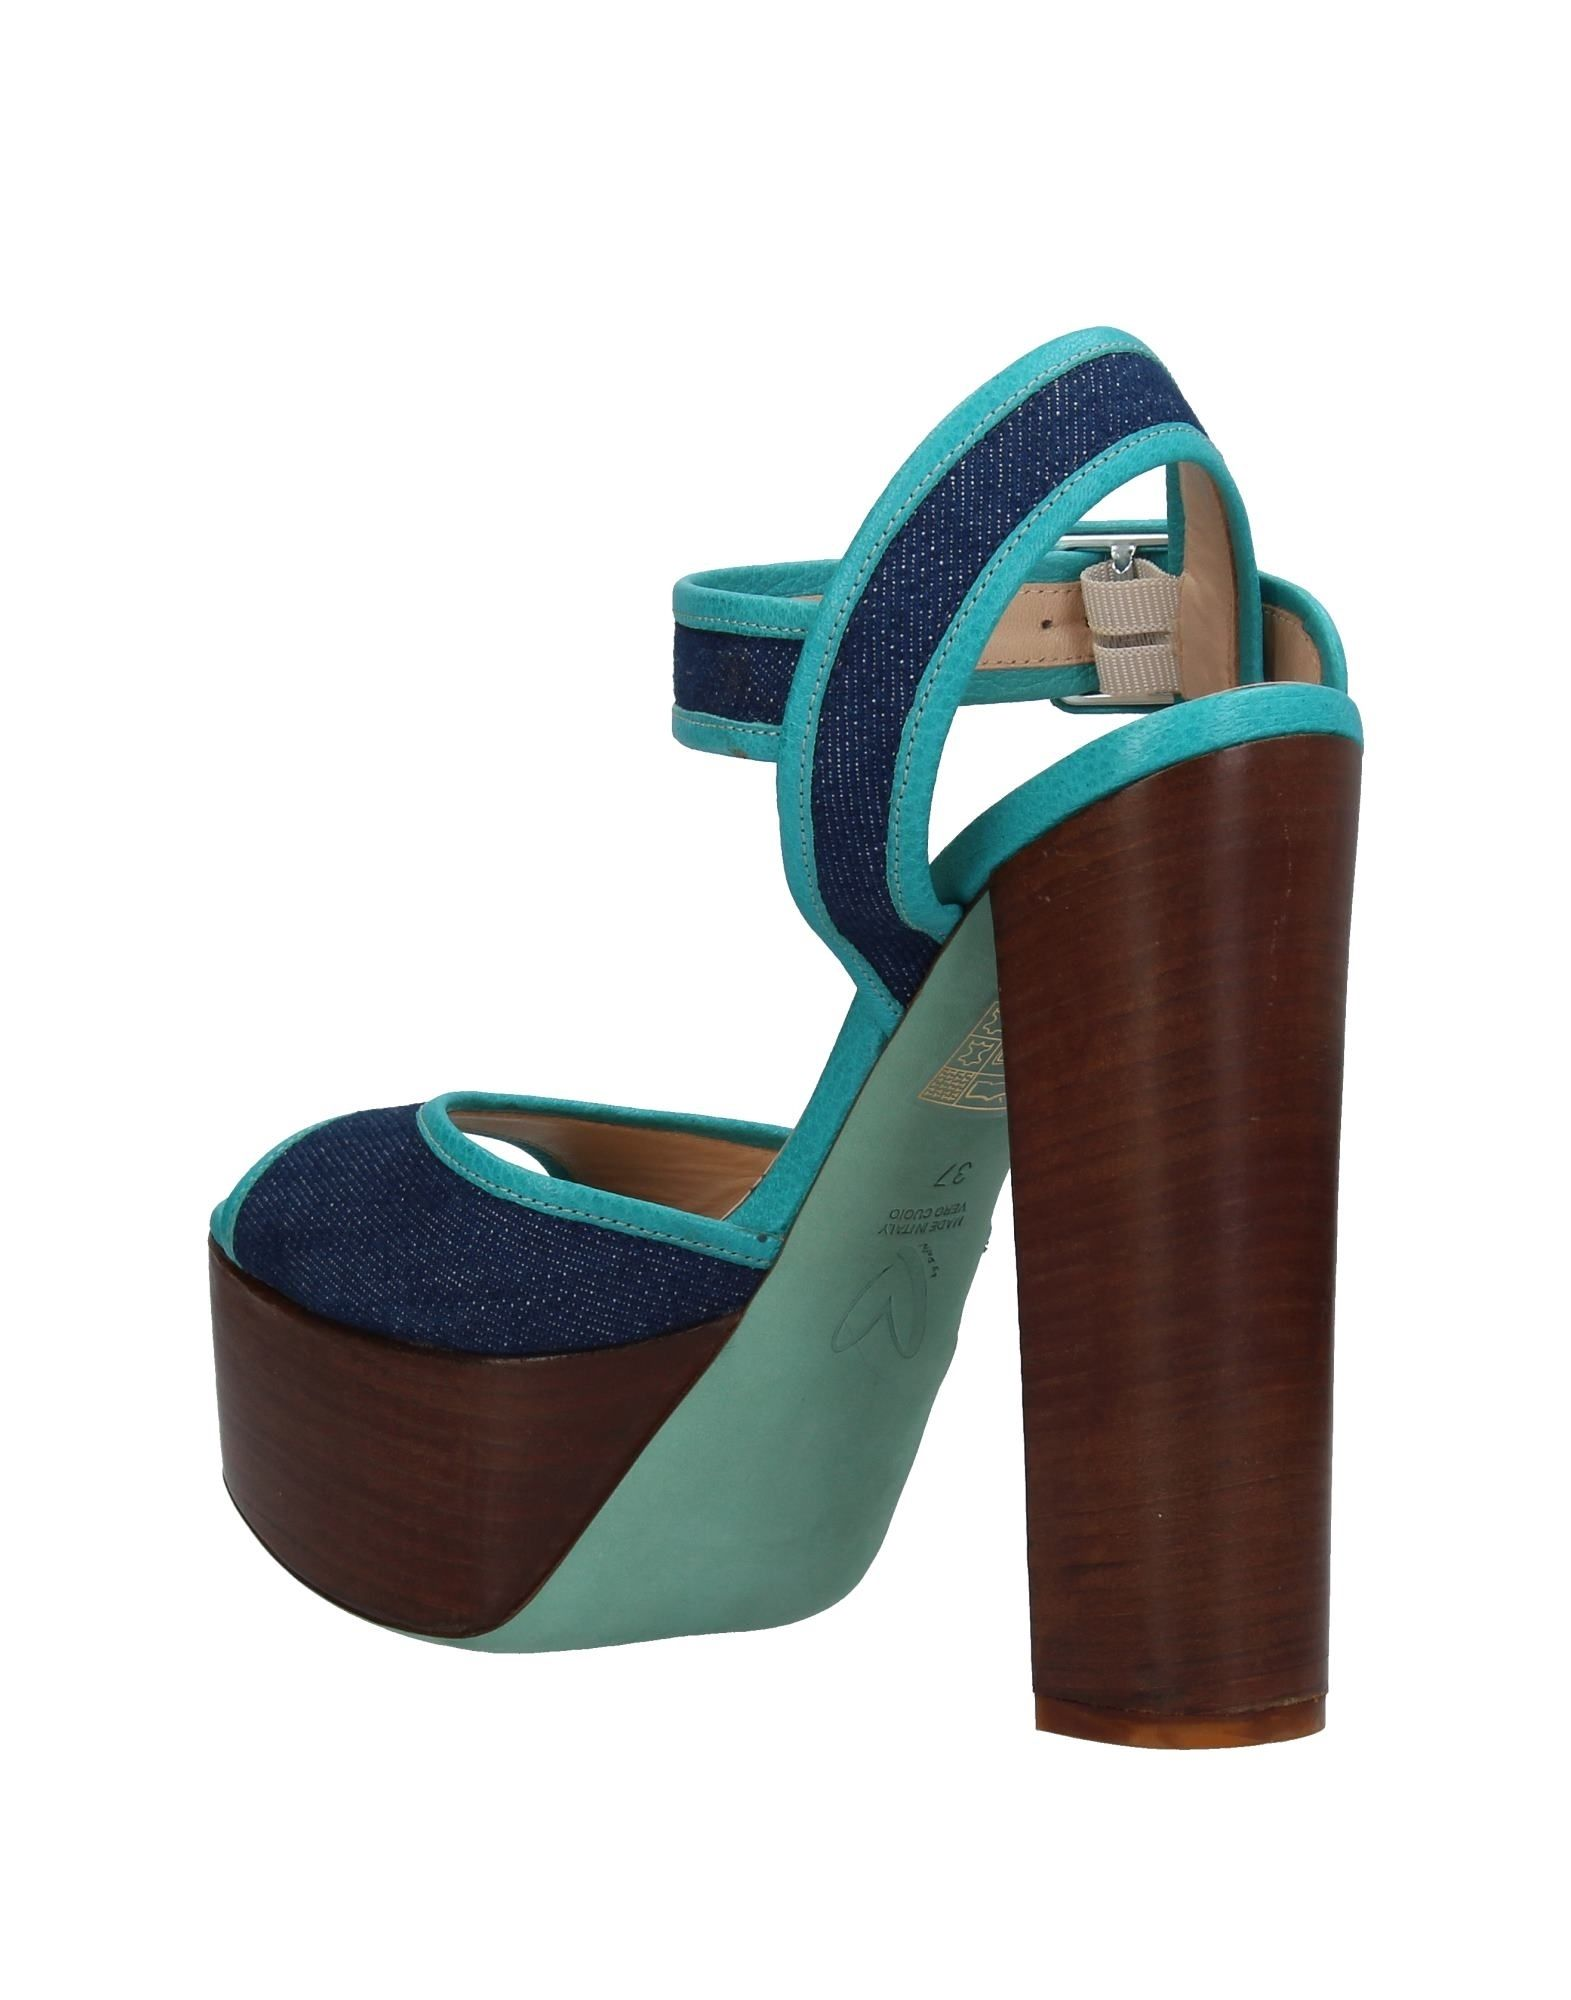 Sandales Mi Piaci By Dafni Femme - Sandales Mi Piaci By Dafni sur